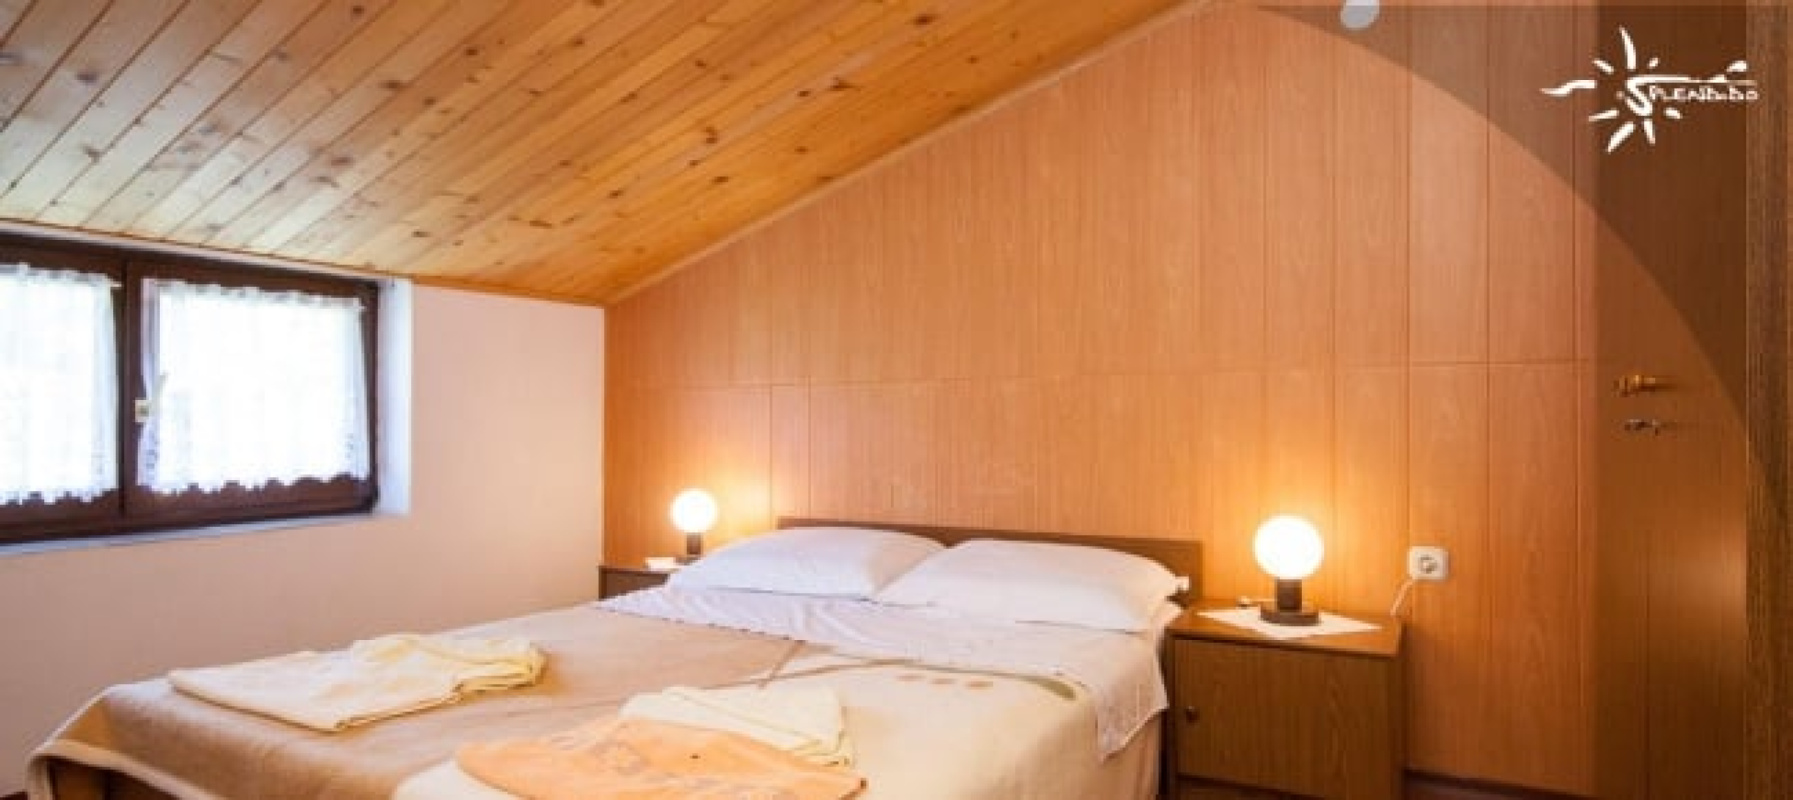 Apartament (4+2) Baška, Baška, Chorwacja